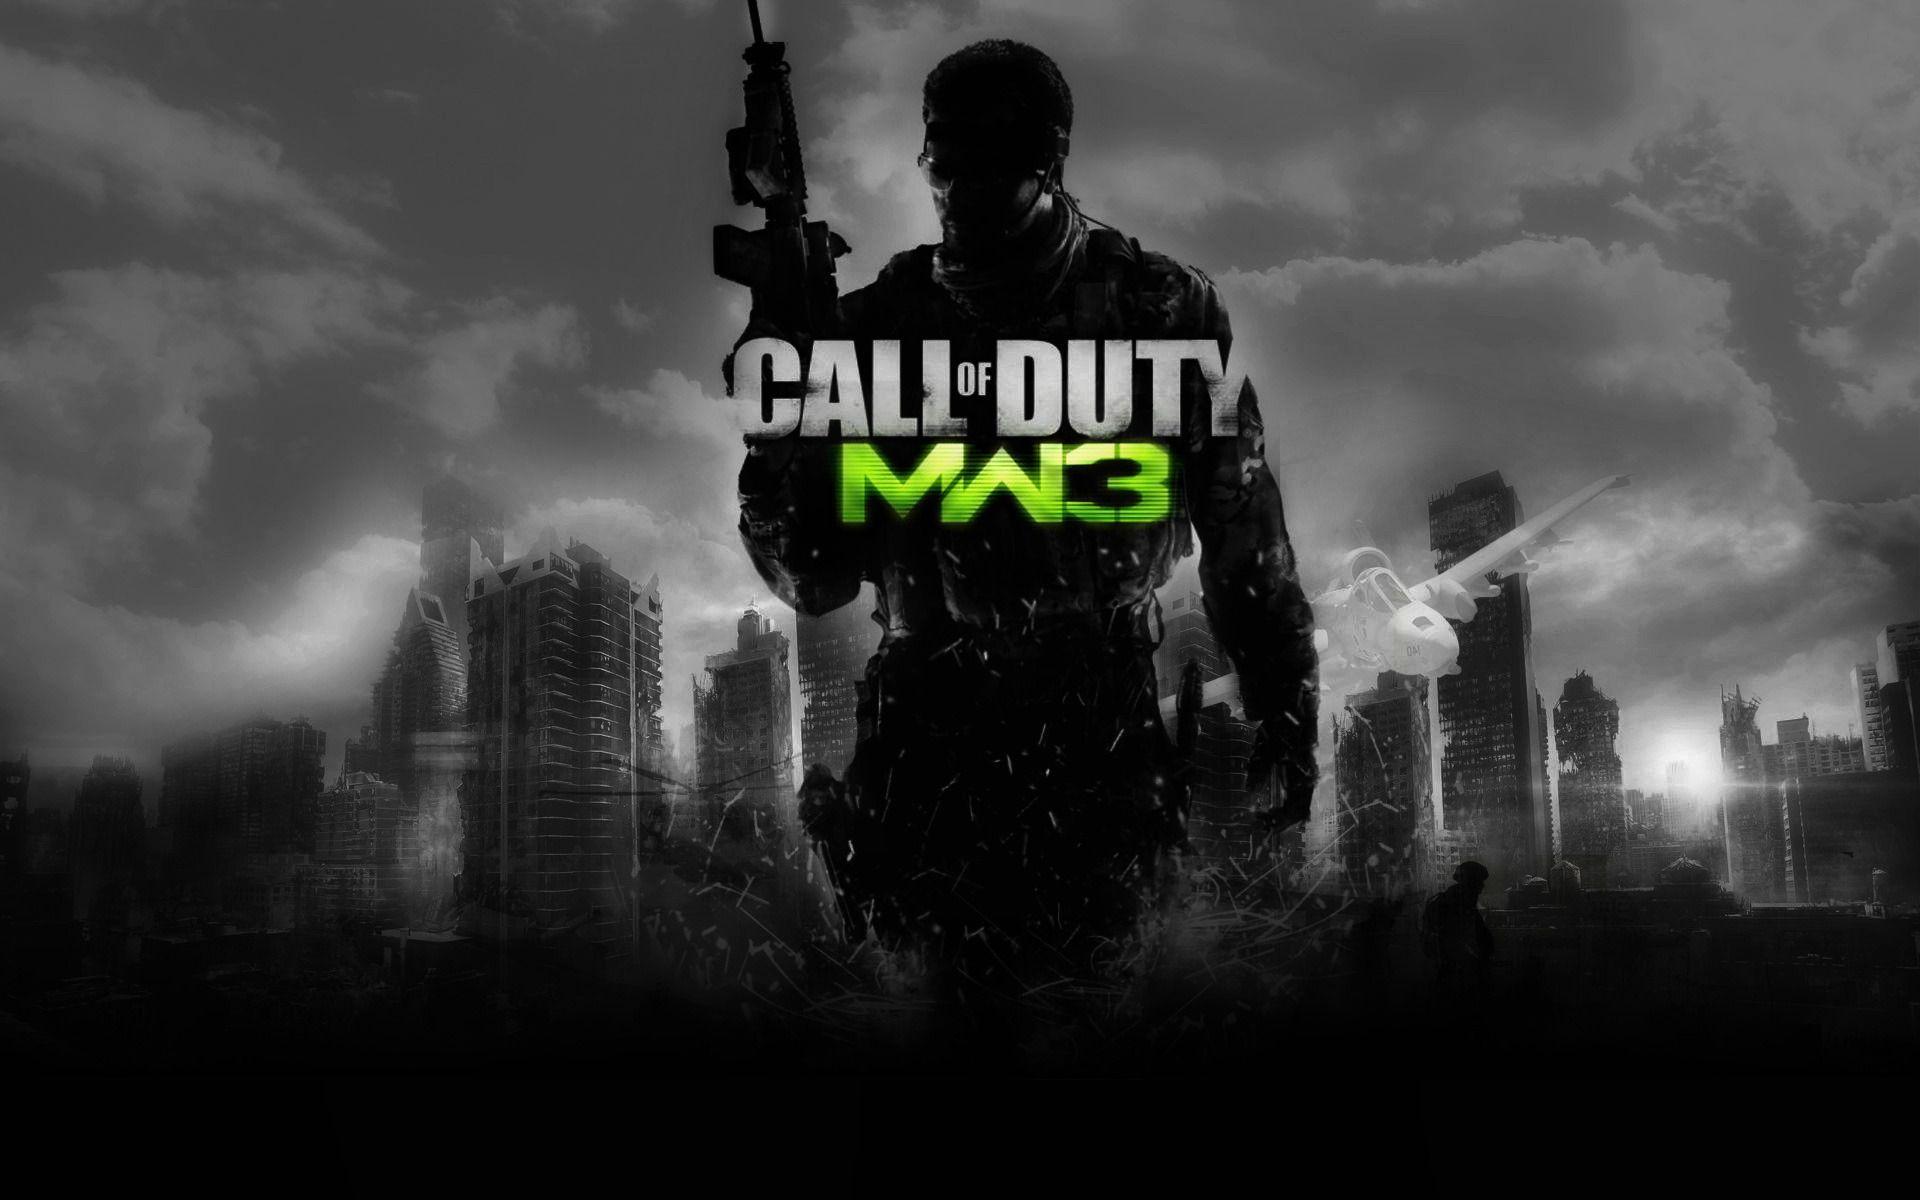 Call Duty Modern Warfare 3 Wallpapers Wallpaper Cave